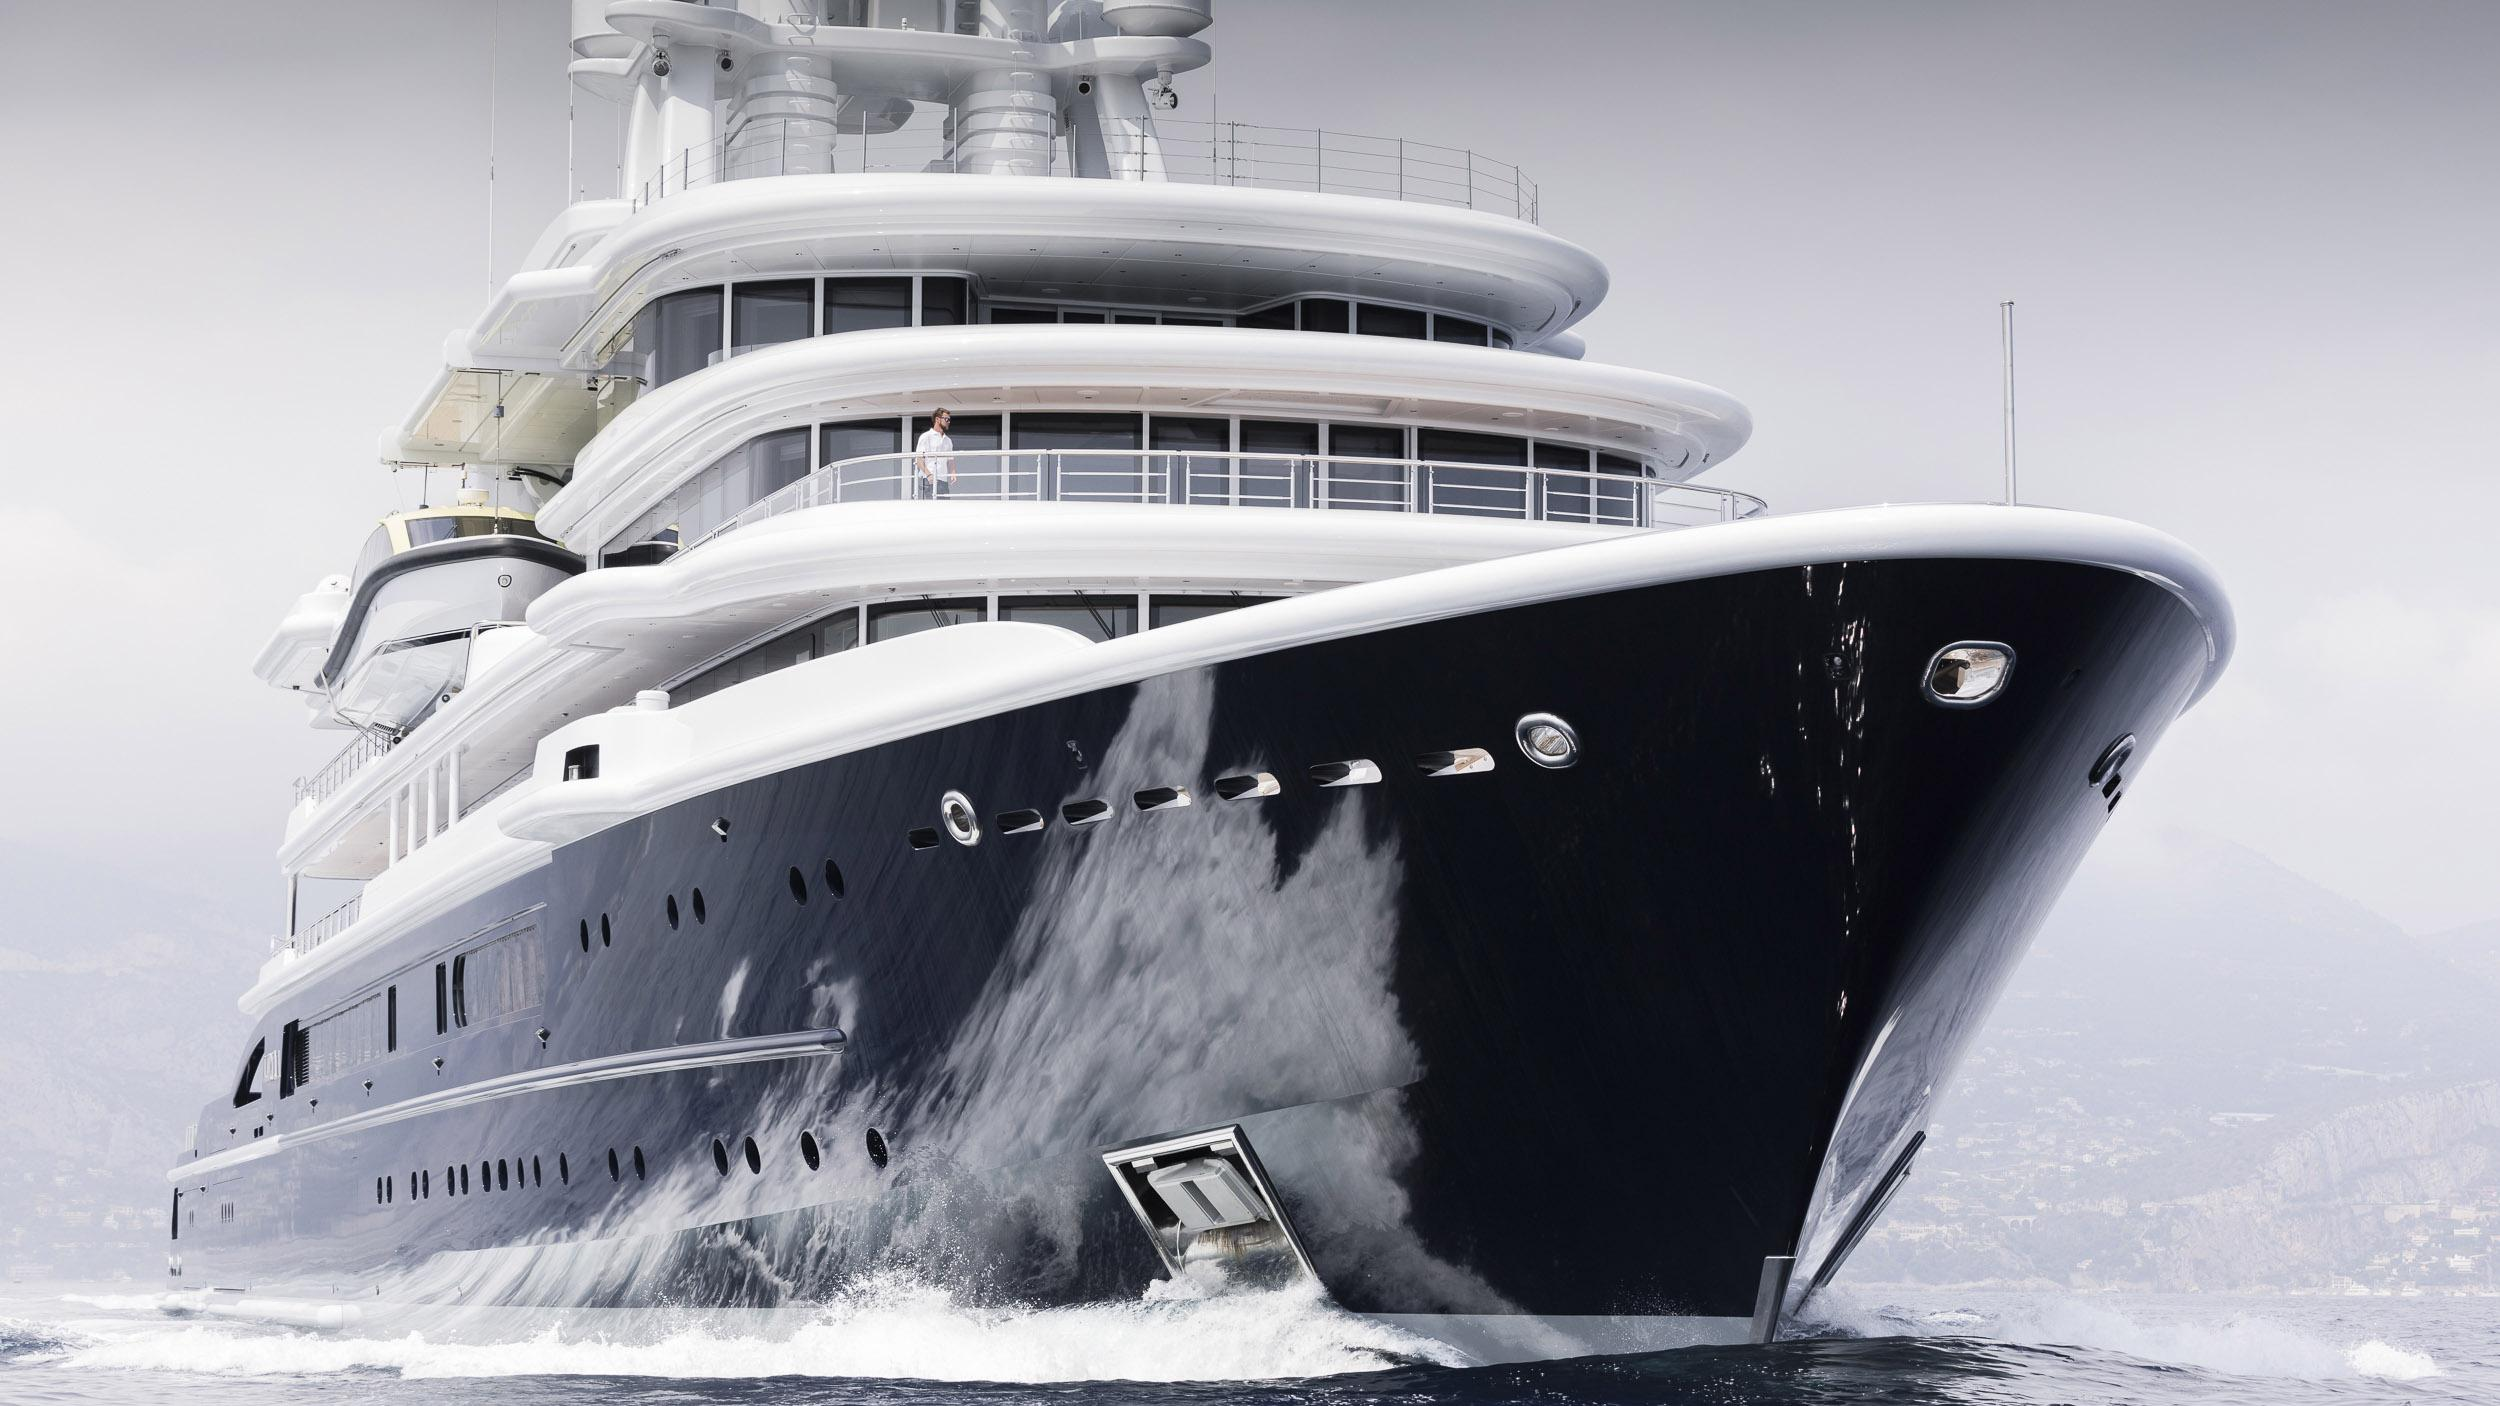 luna superyacht lloyd werft 2010 115m cruising half profile